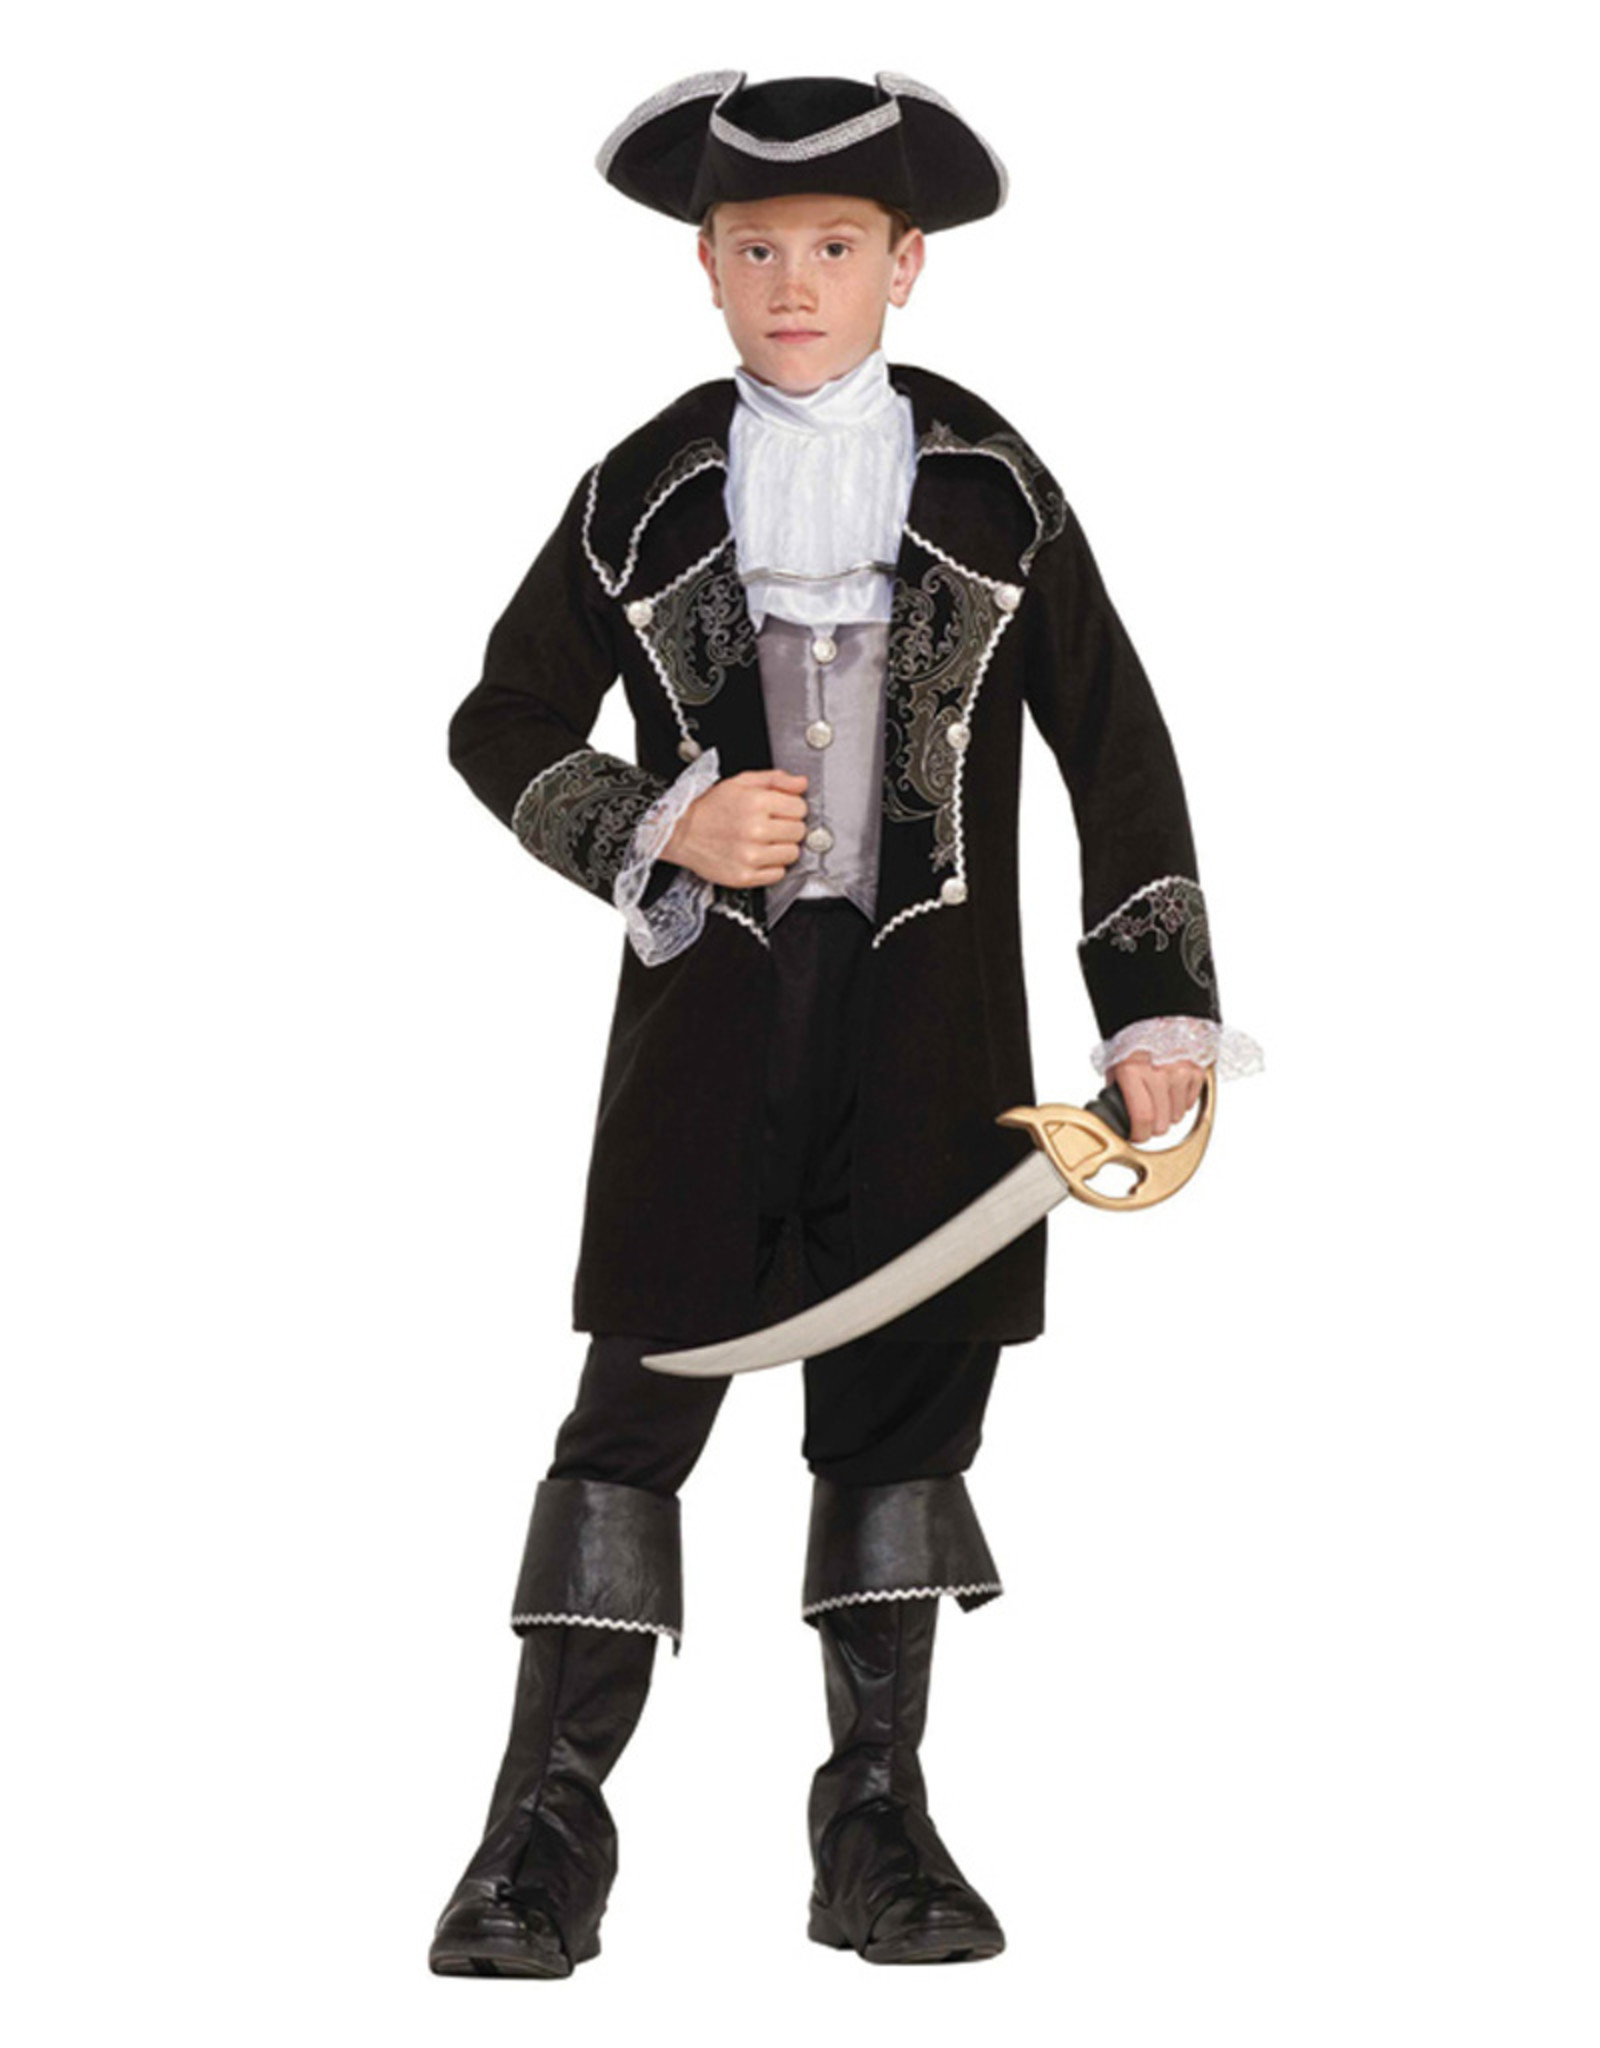 Swashbuckler Costume - Boys